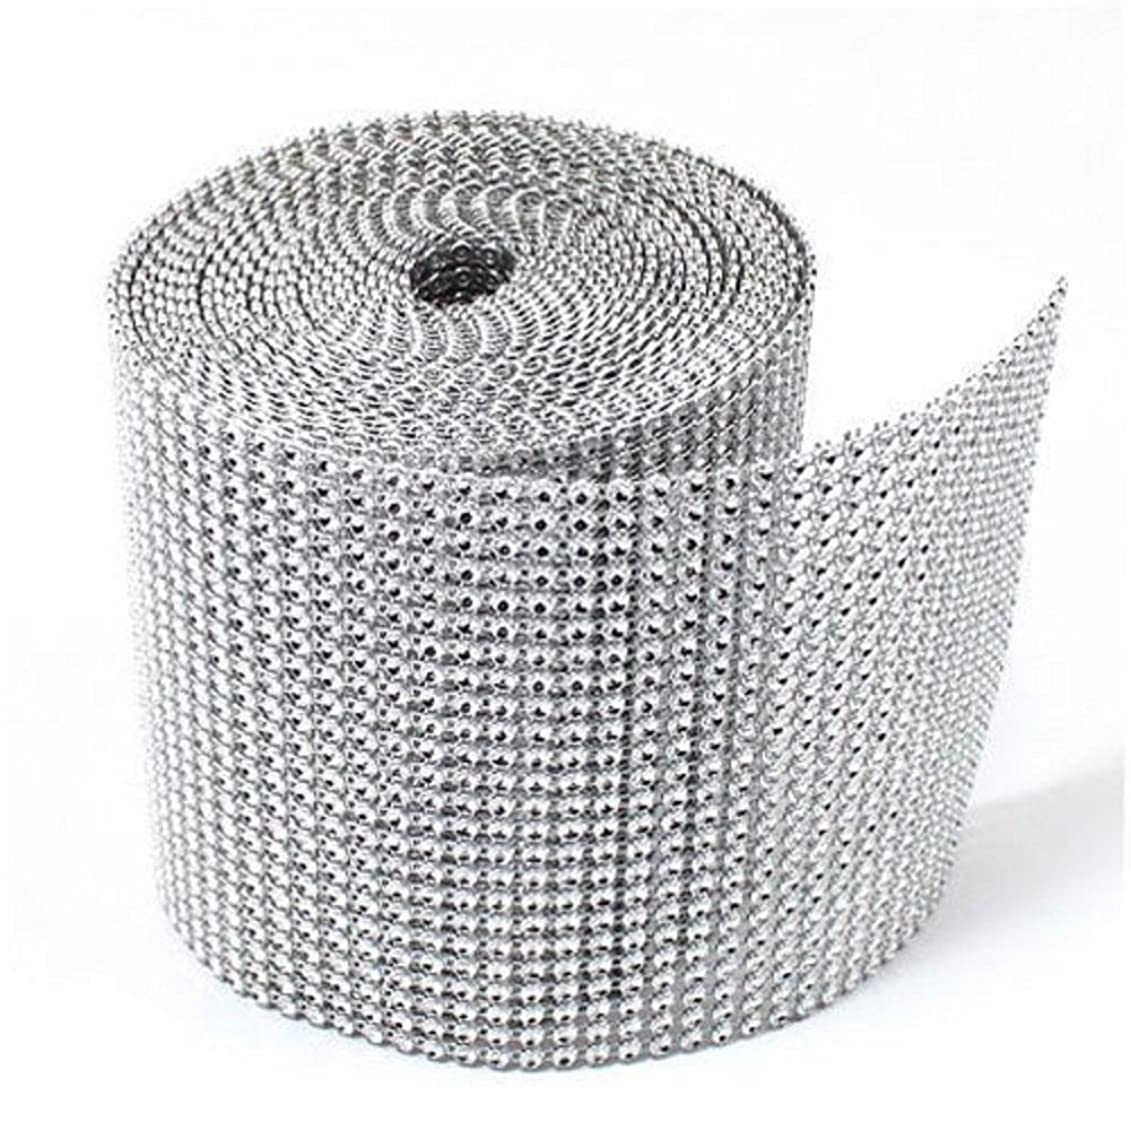 KUPOO Diamond Sparkling Rhinestone Mesh Ribbon for Event Decorations, Wedding Cake, Birthdays, Baby Shower, Arts and Crafts, 10 Yards, 24 Row (silver)